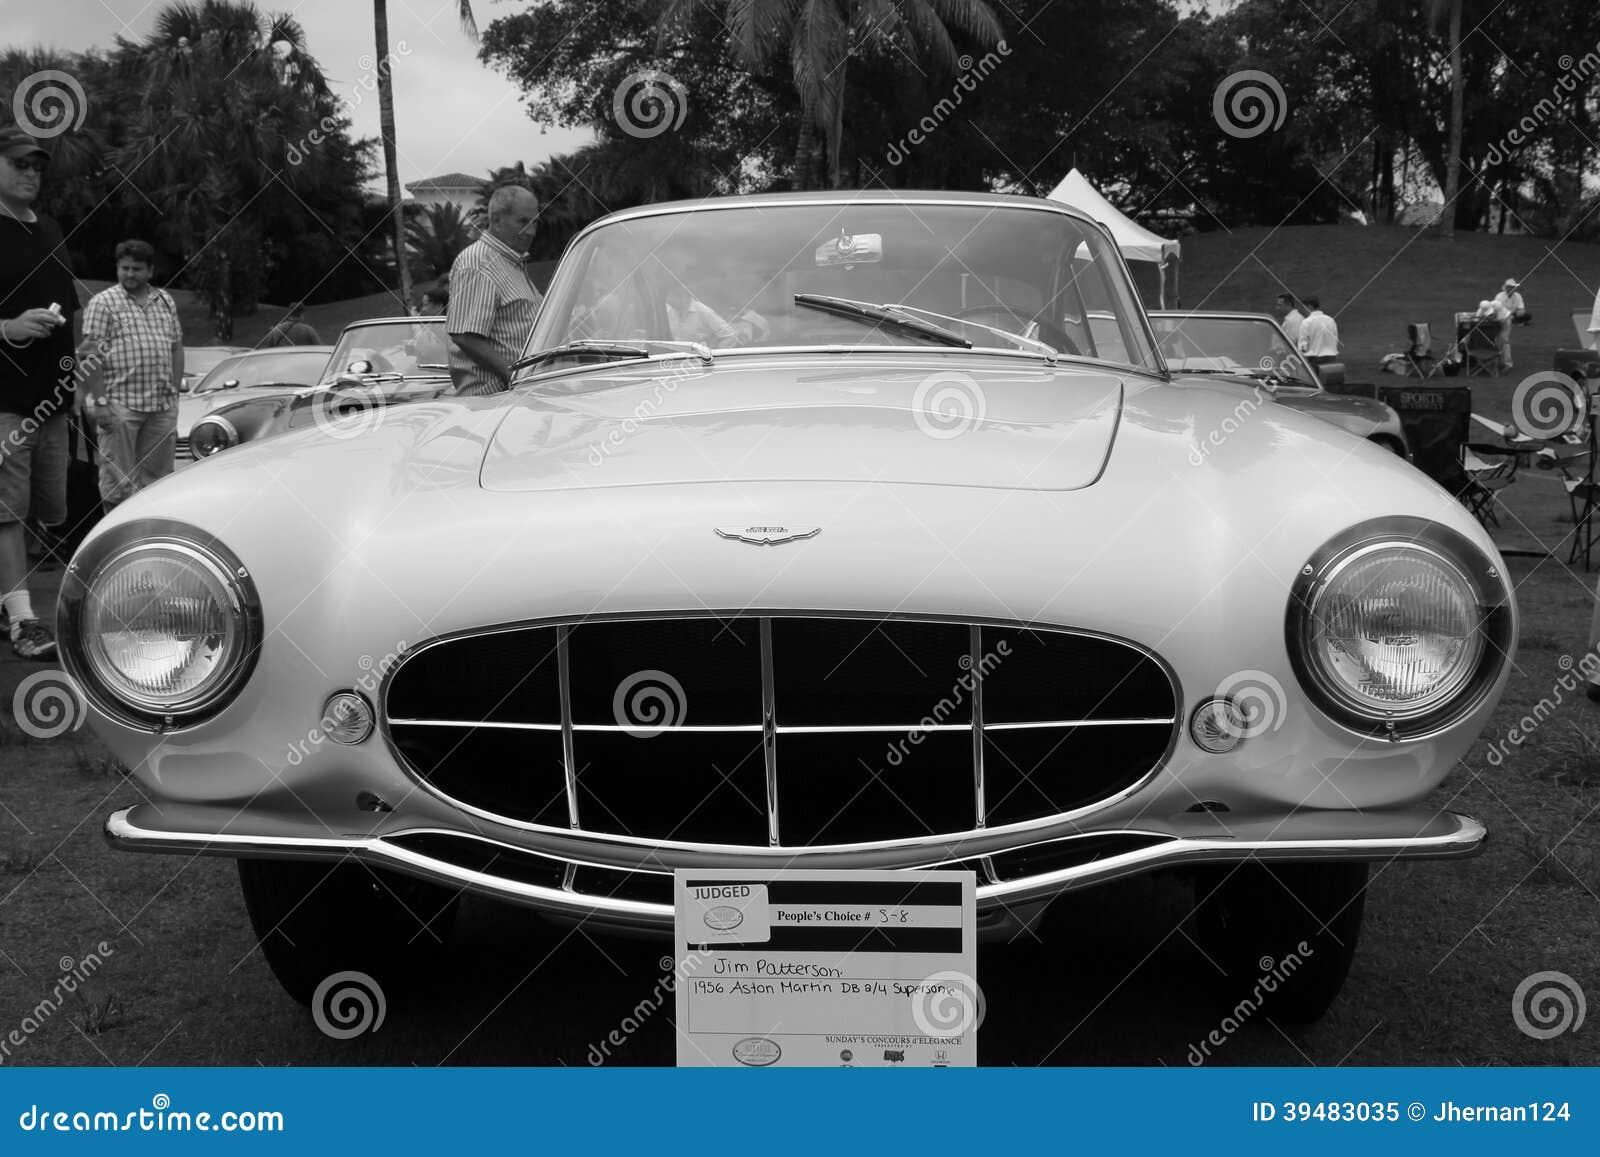 Rare 1950s Aston Martin Model Front View B W Editorial Image Image